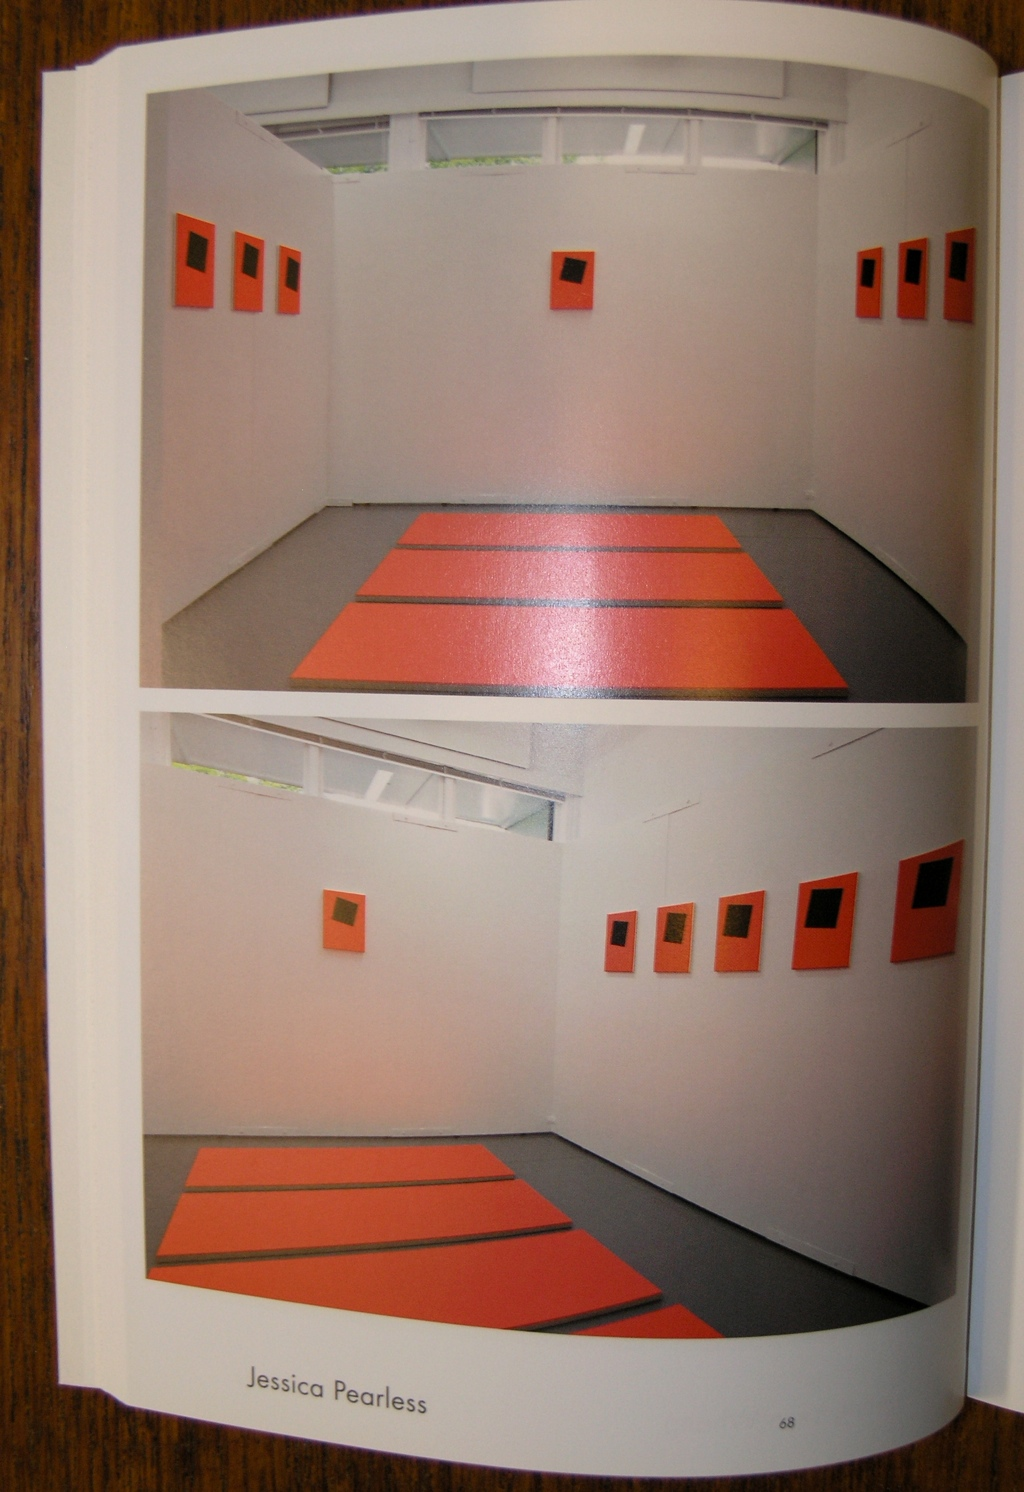 Elam Graduate Work 2010 Exhibition Catalogue